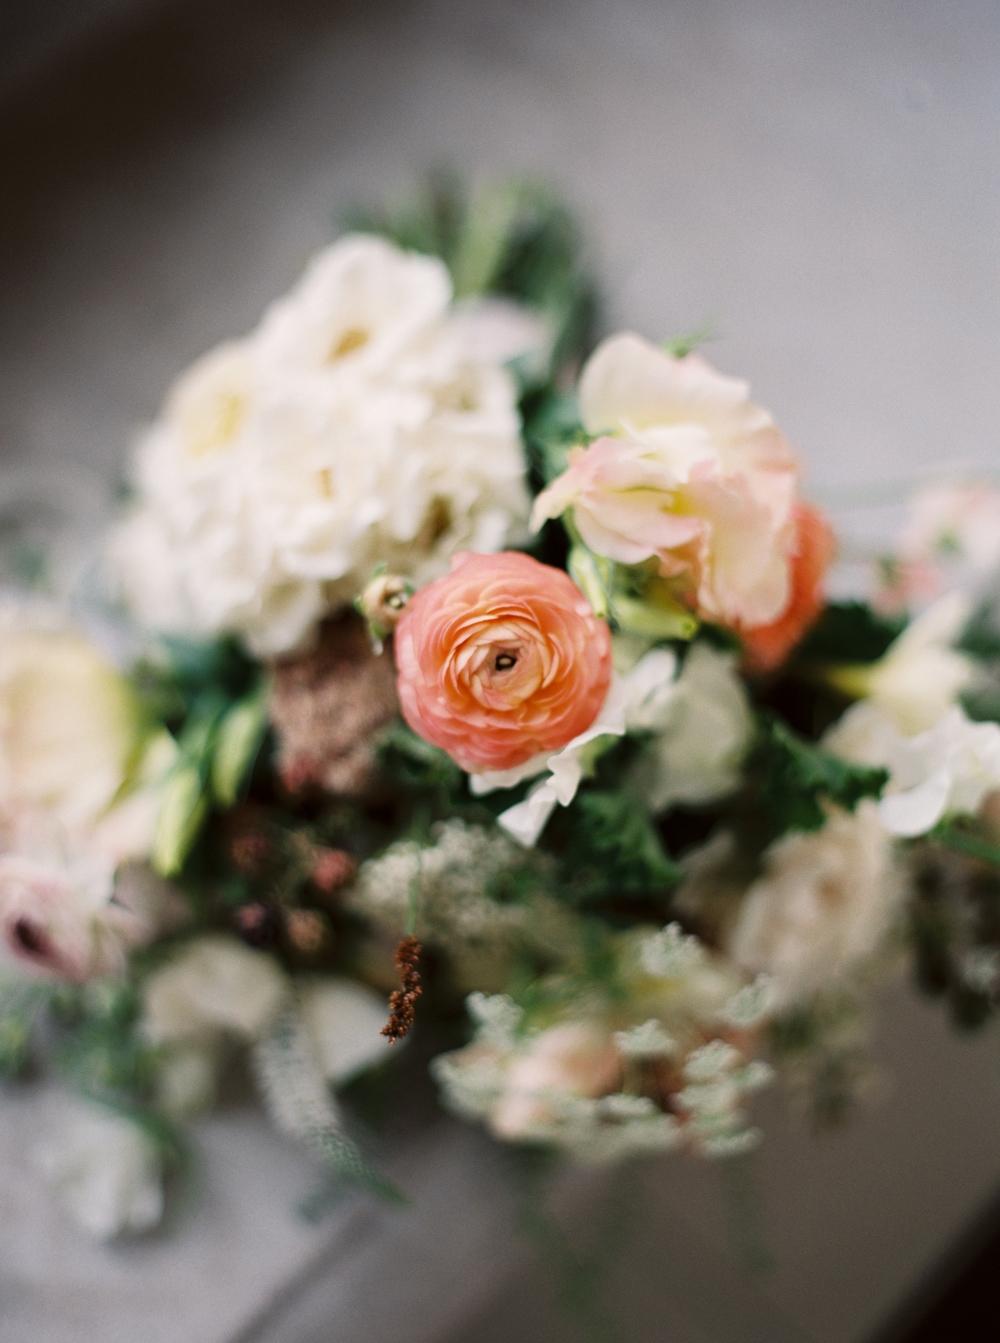 Kyle John l Fine Art Wedding Photography l Chicago, Copenhagen, California, New York, Destination l Blog l Kendahl_15